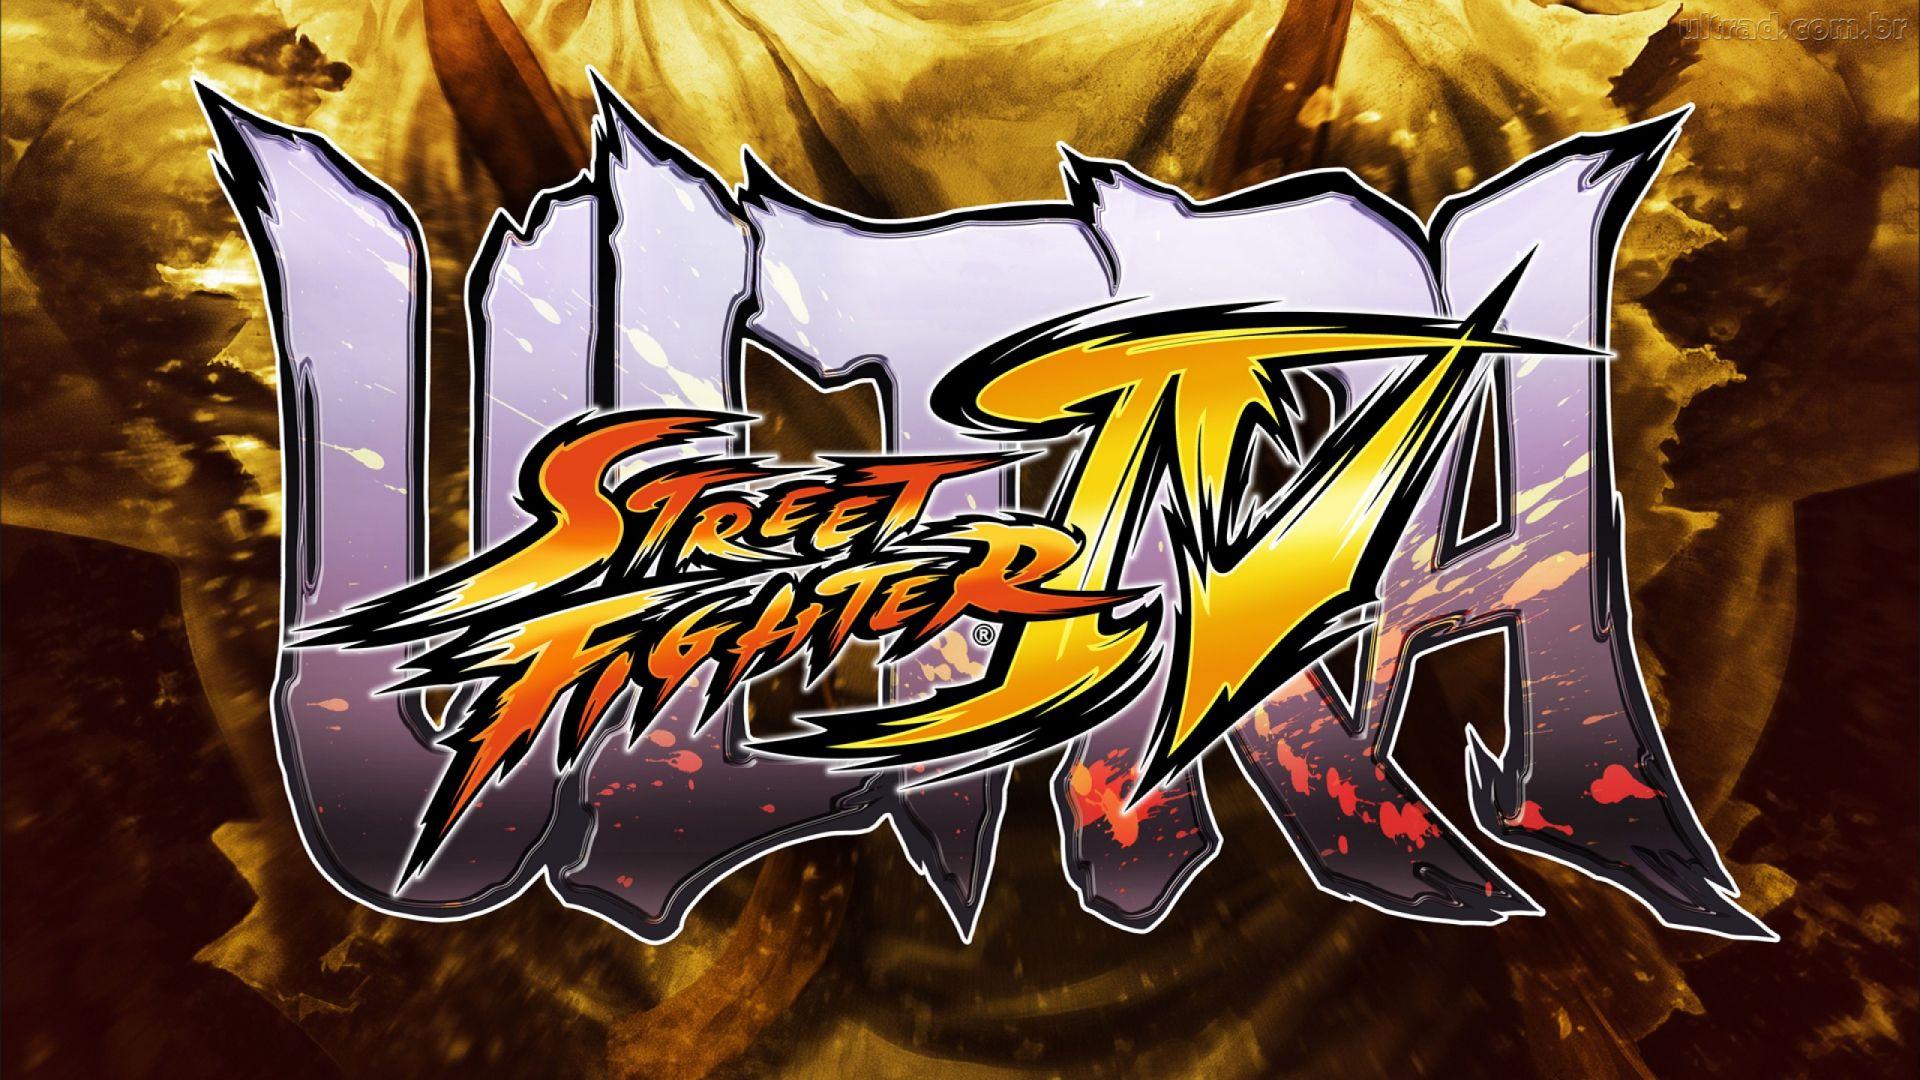 اموزش انلاین بازی کردن Ultra Street Fighter IV